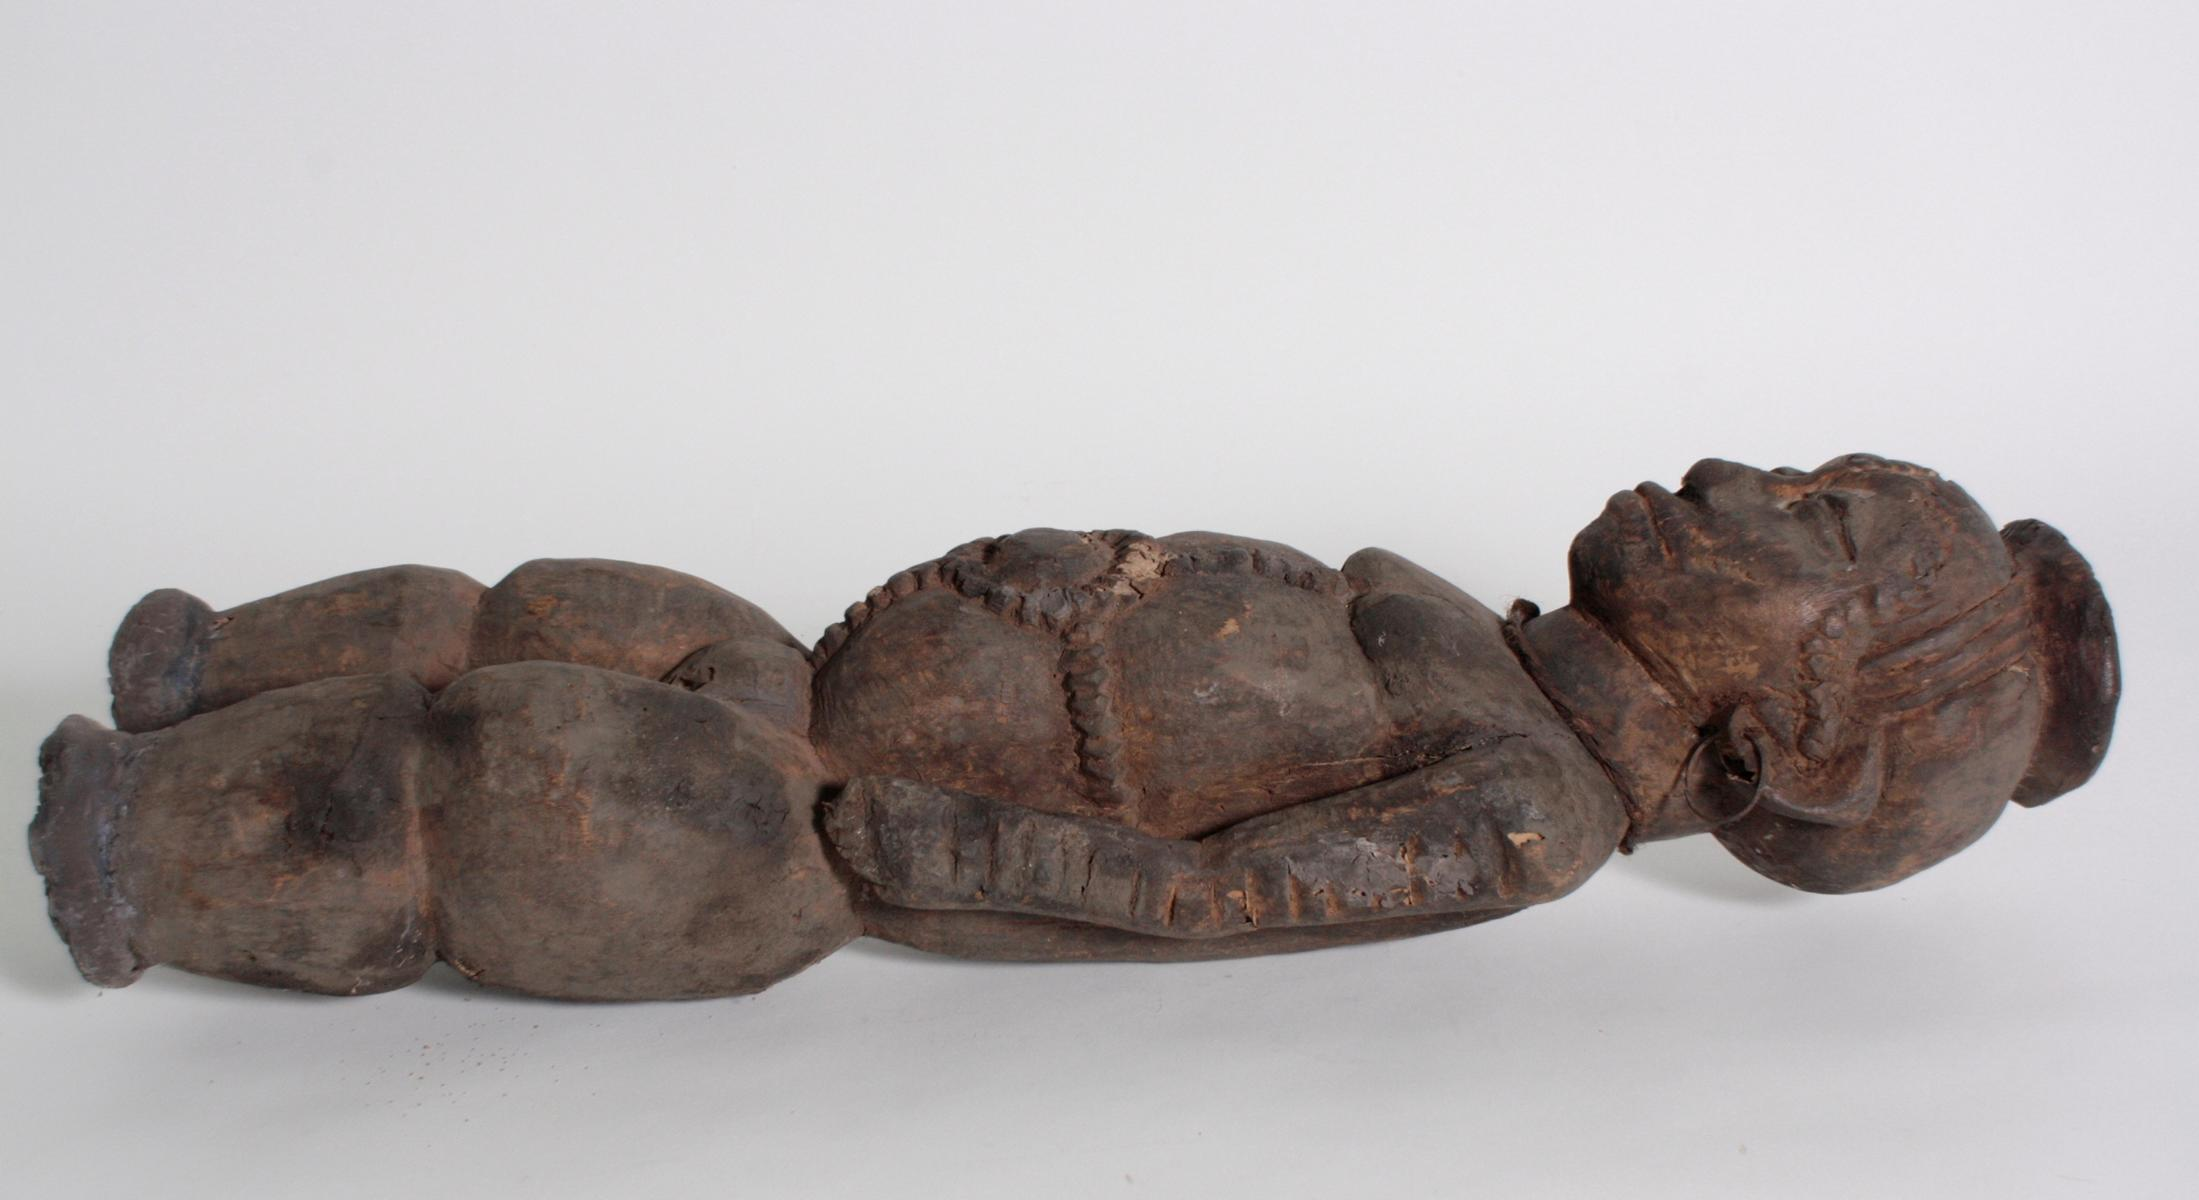 Ältere Ahnen-Figur, Tabwa, D. R. Kongo-7